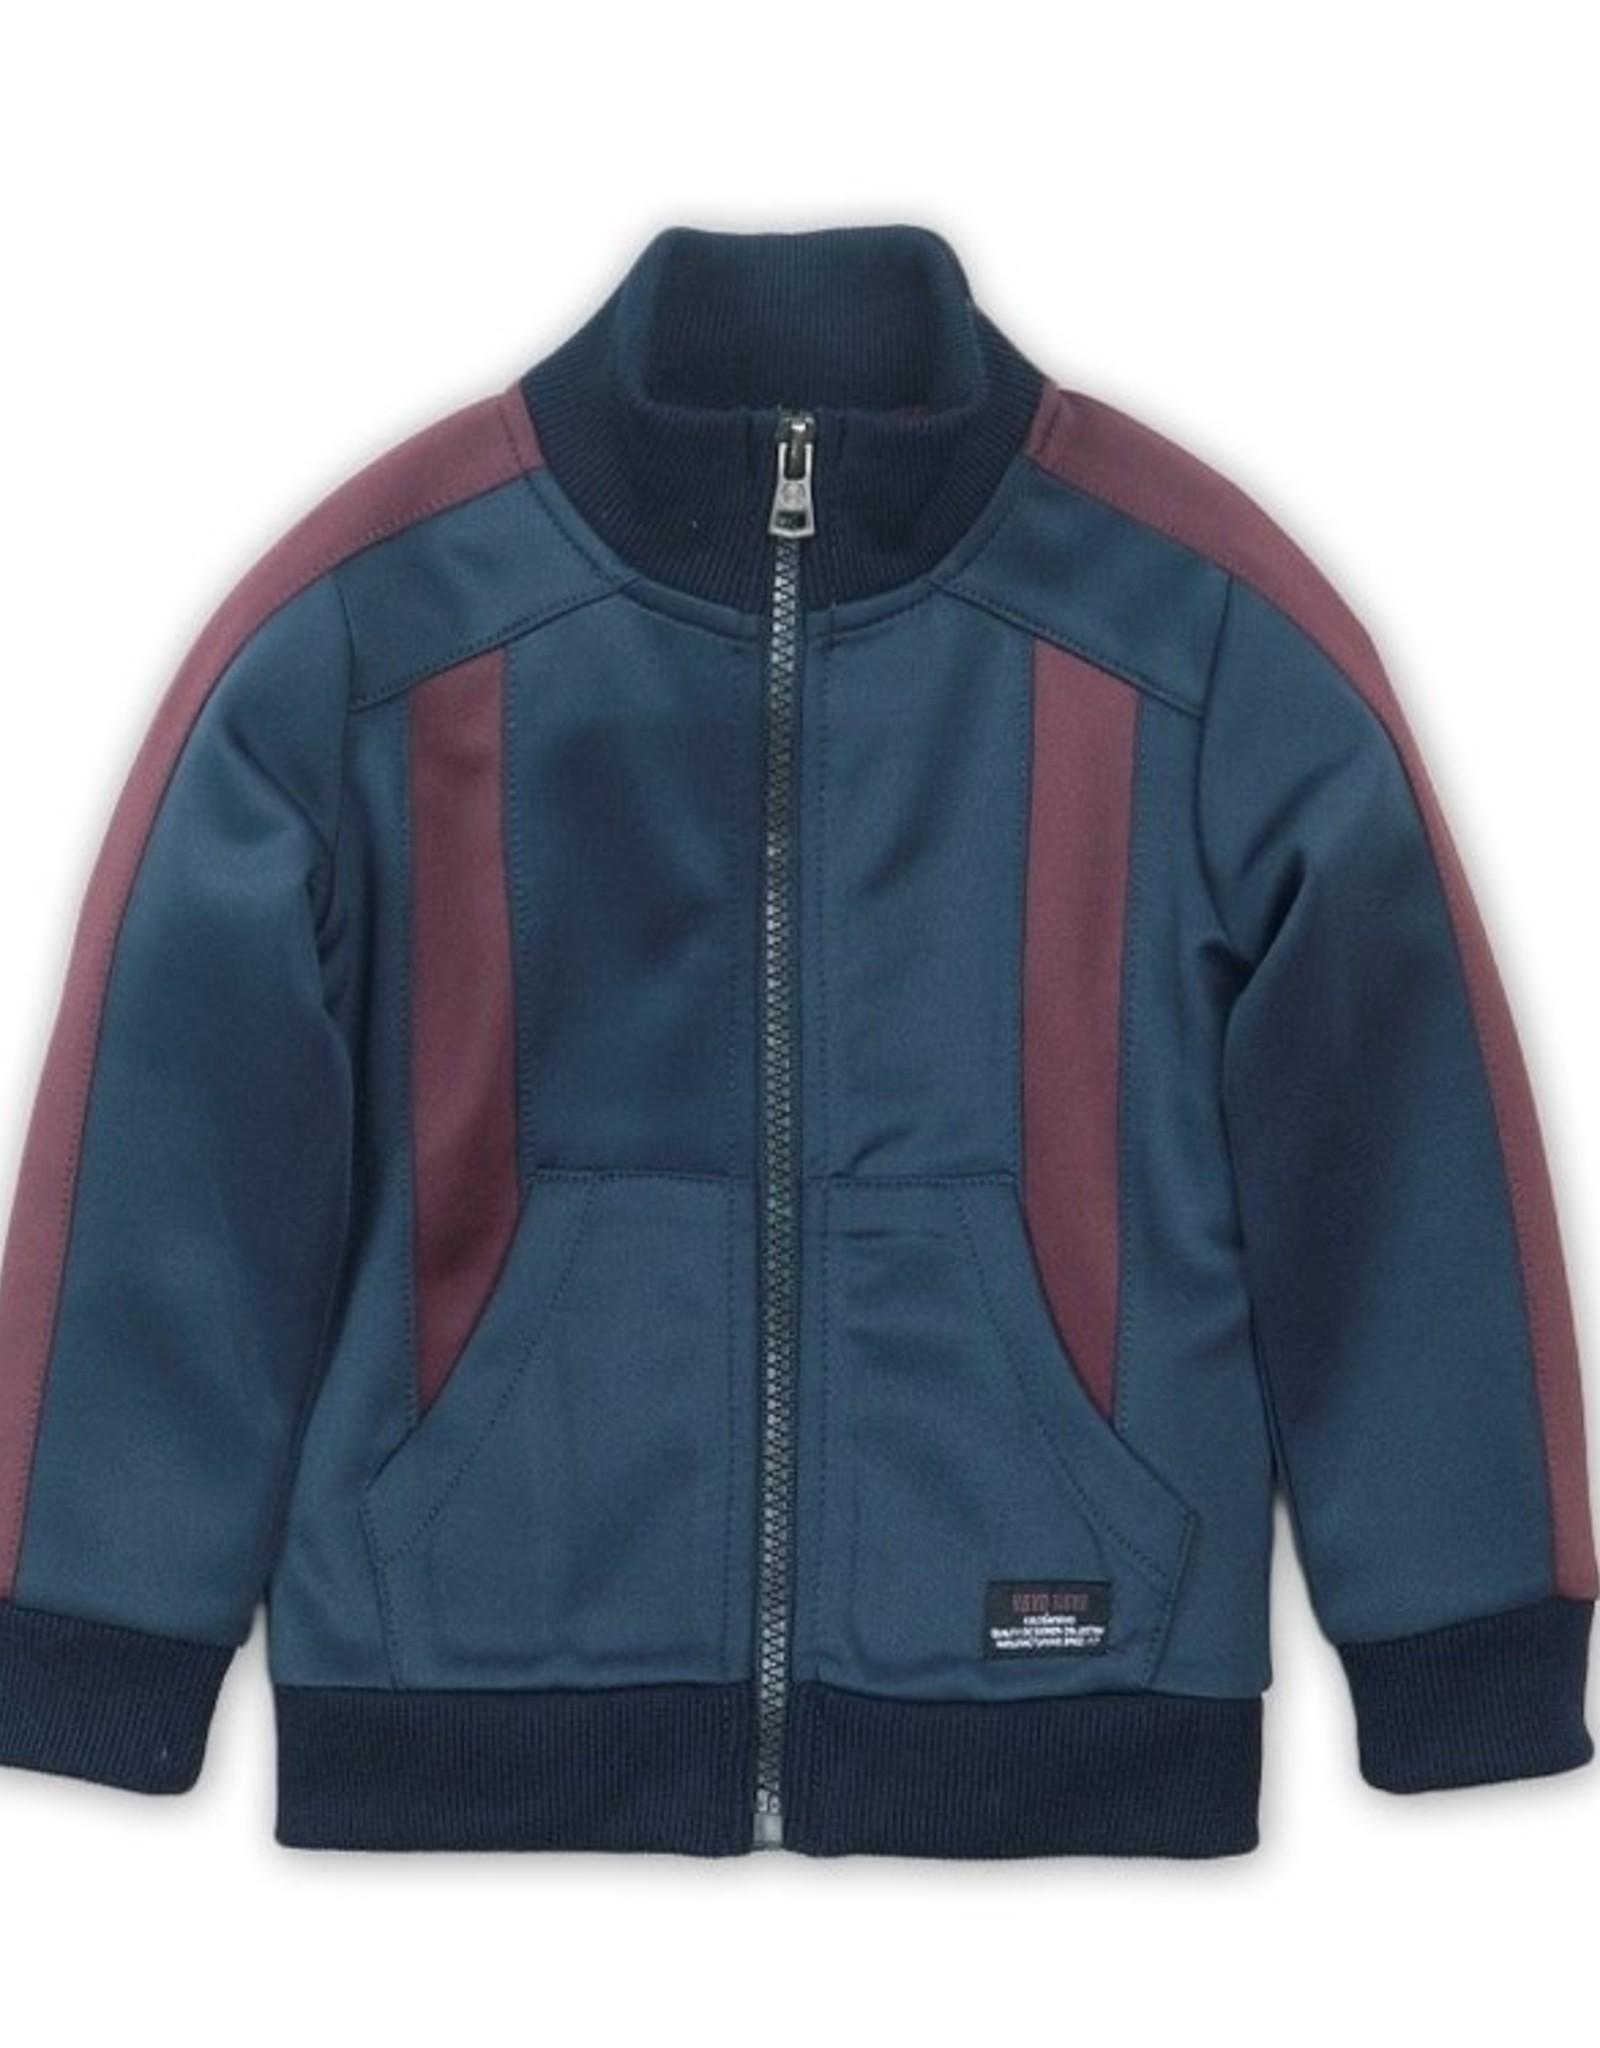 Koko Noko FA20 Full Zip Blue Track Jacket